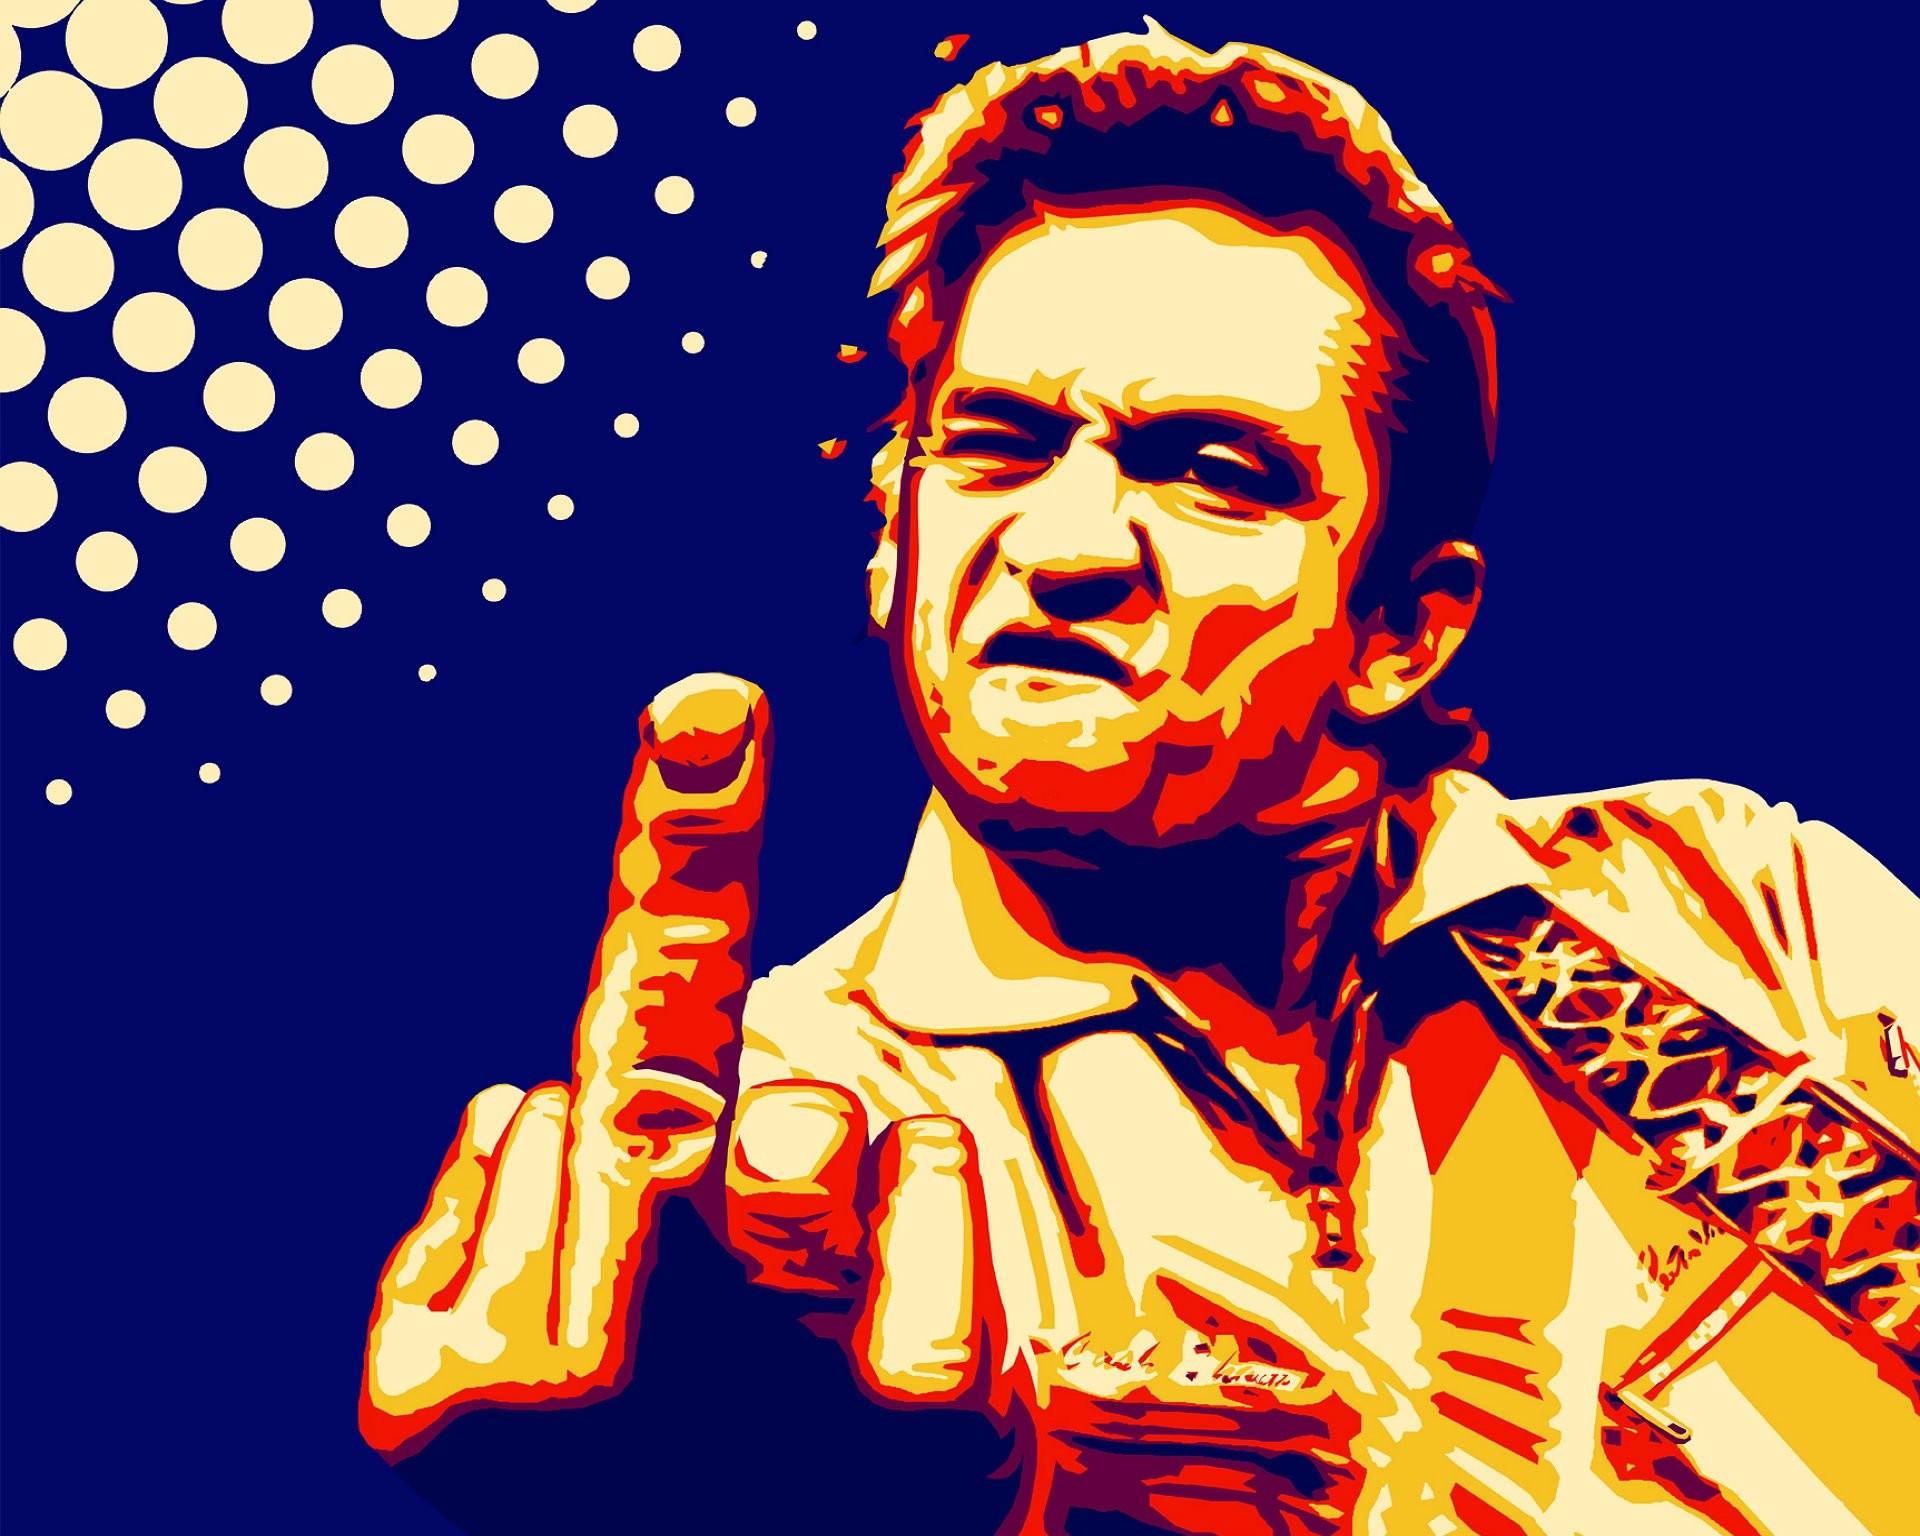 2560x1600 JOHNNY CASH Countrywestern Country Western Blues Singer 1jcash Actor Folk Rockabilly Gospel Rock Roll Guitar Poster Wallpaper